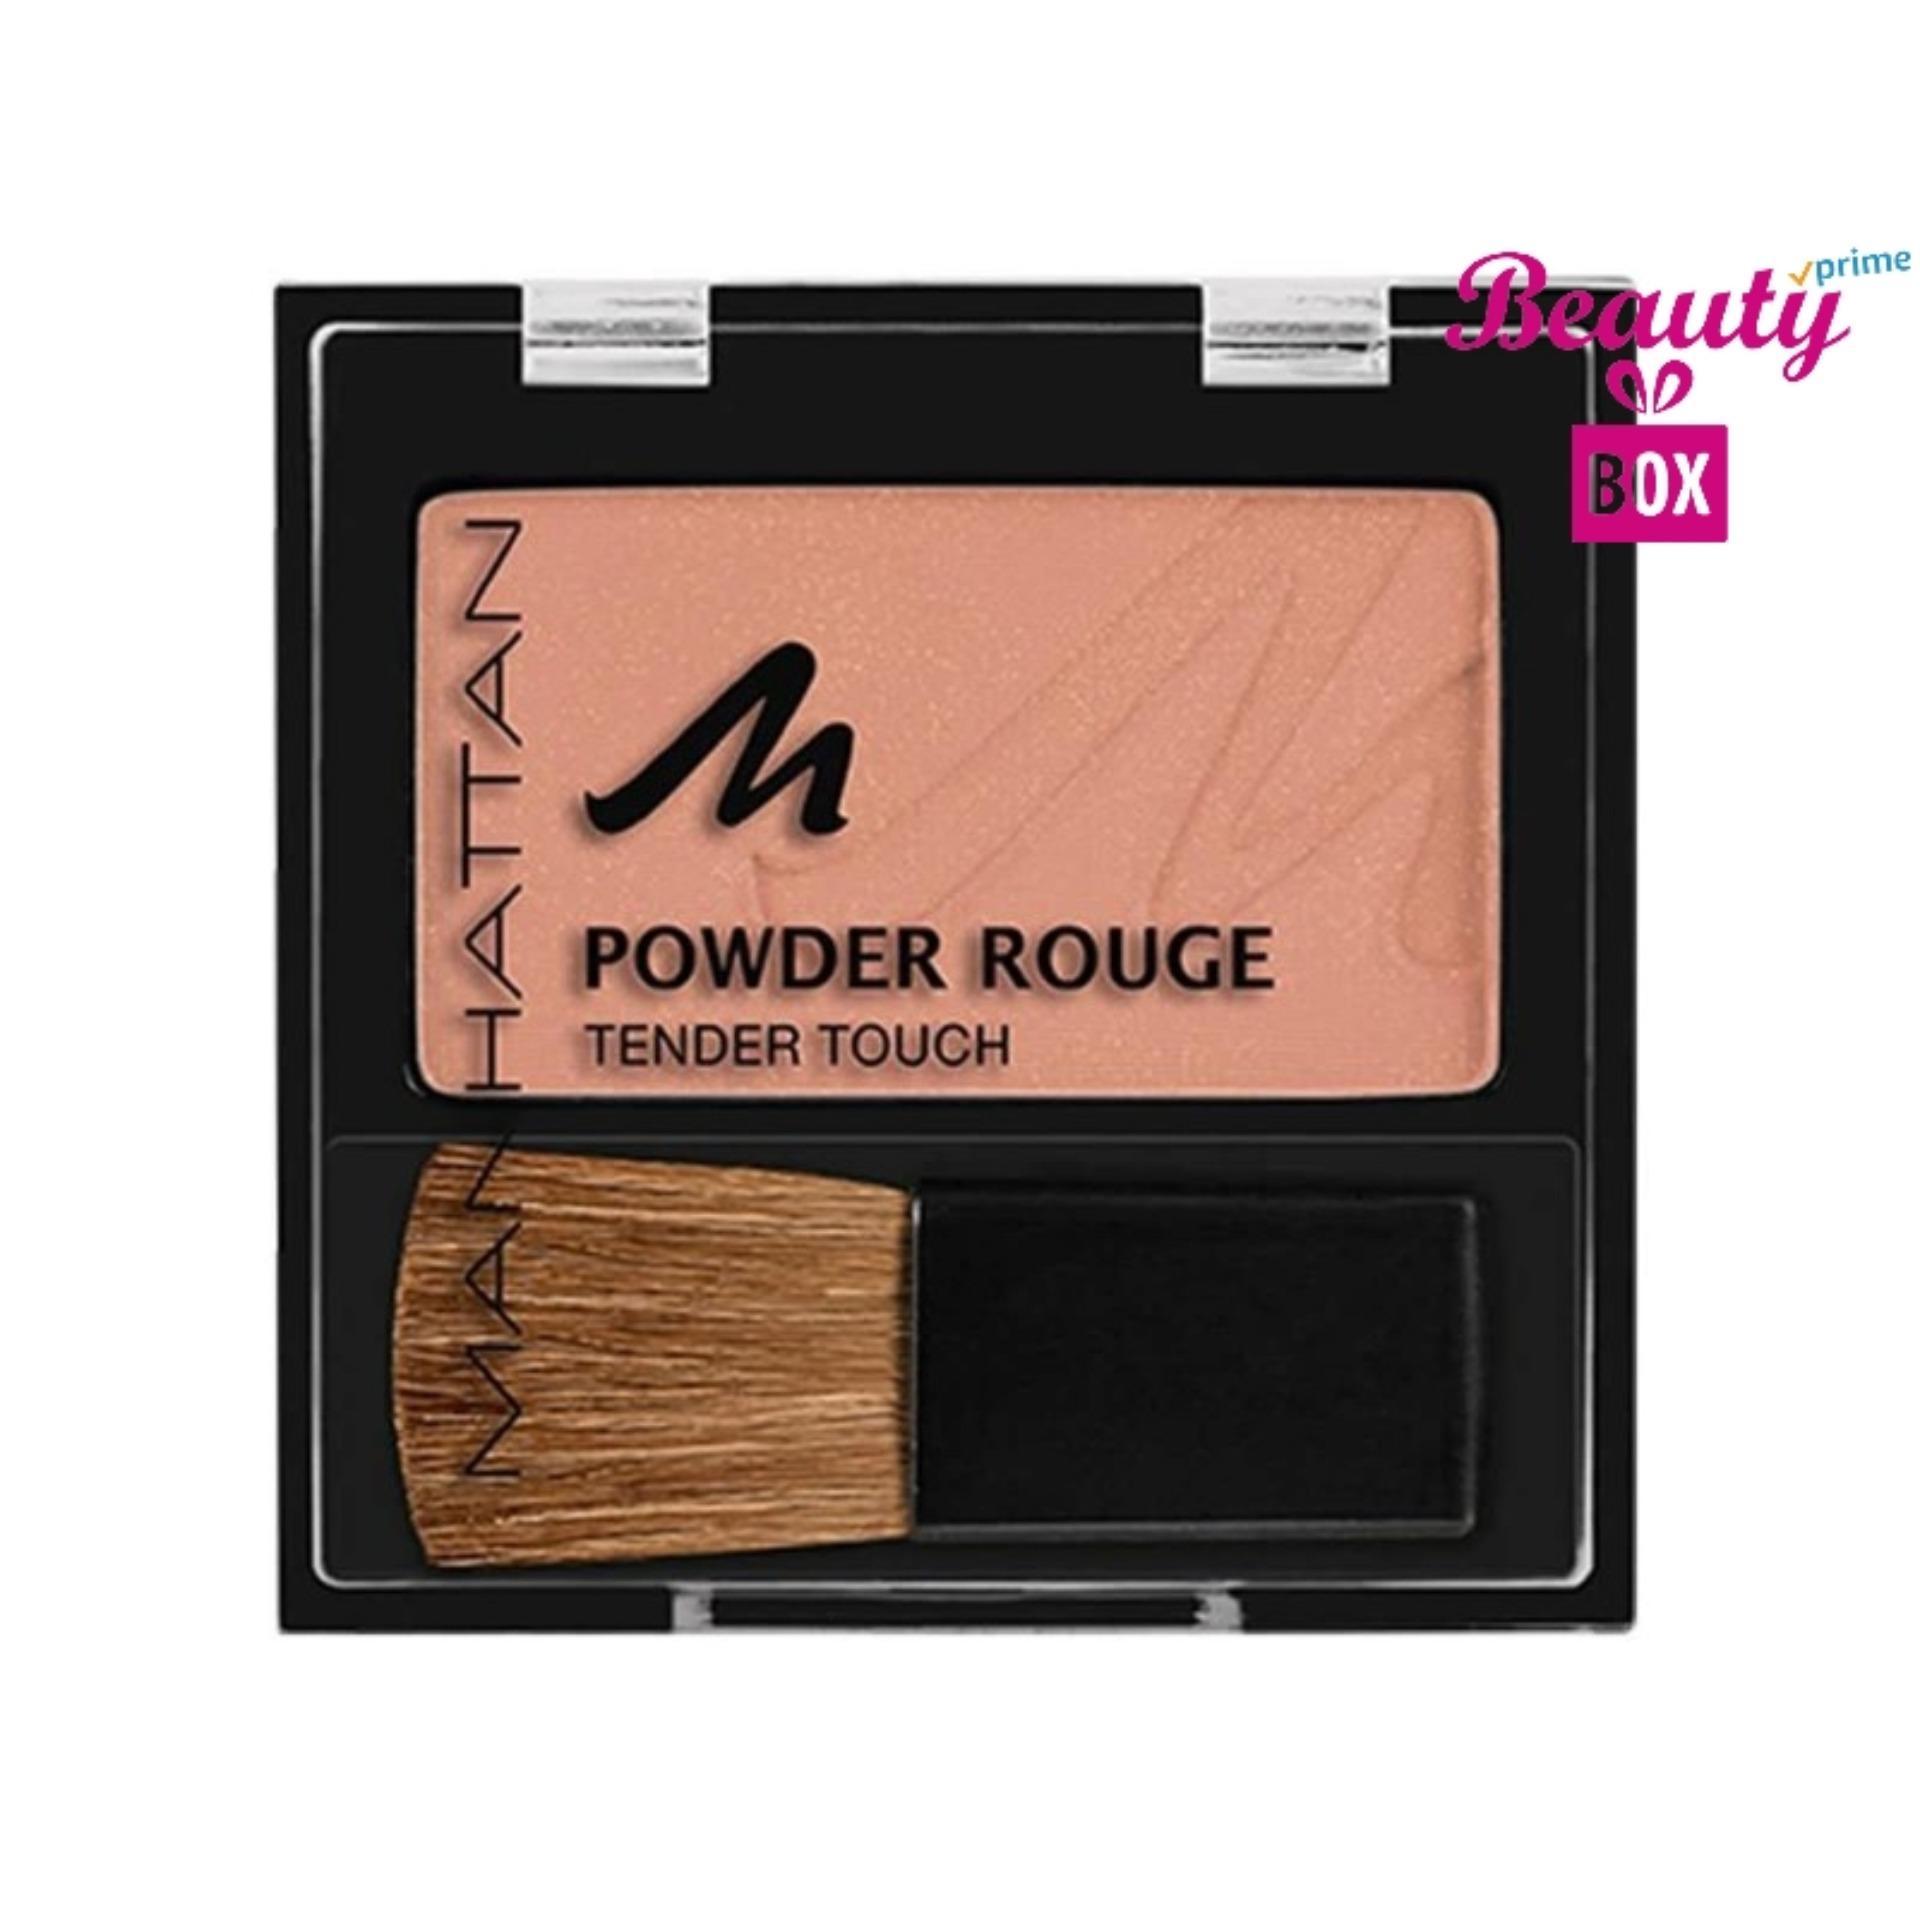 Manhattan Powder Rouge Tender Touch Blush - Nude Mood